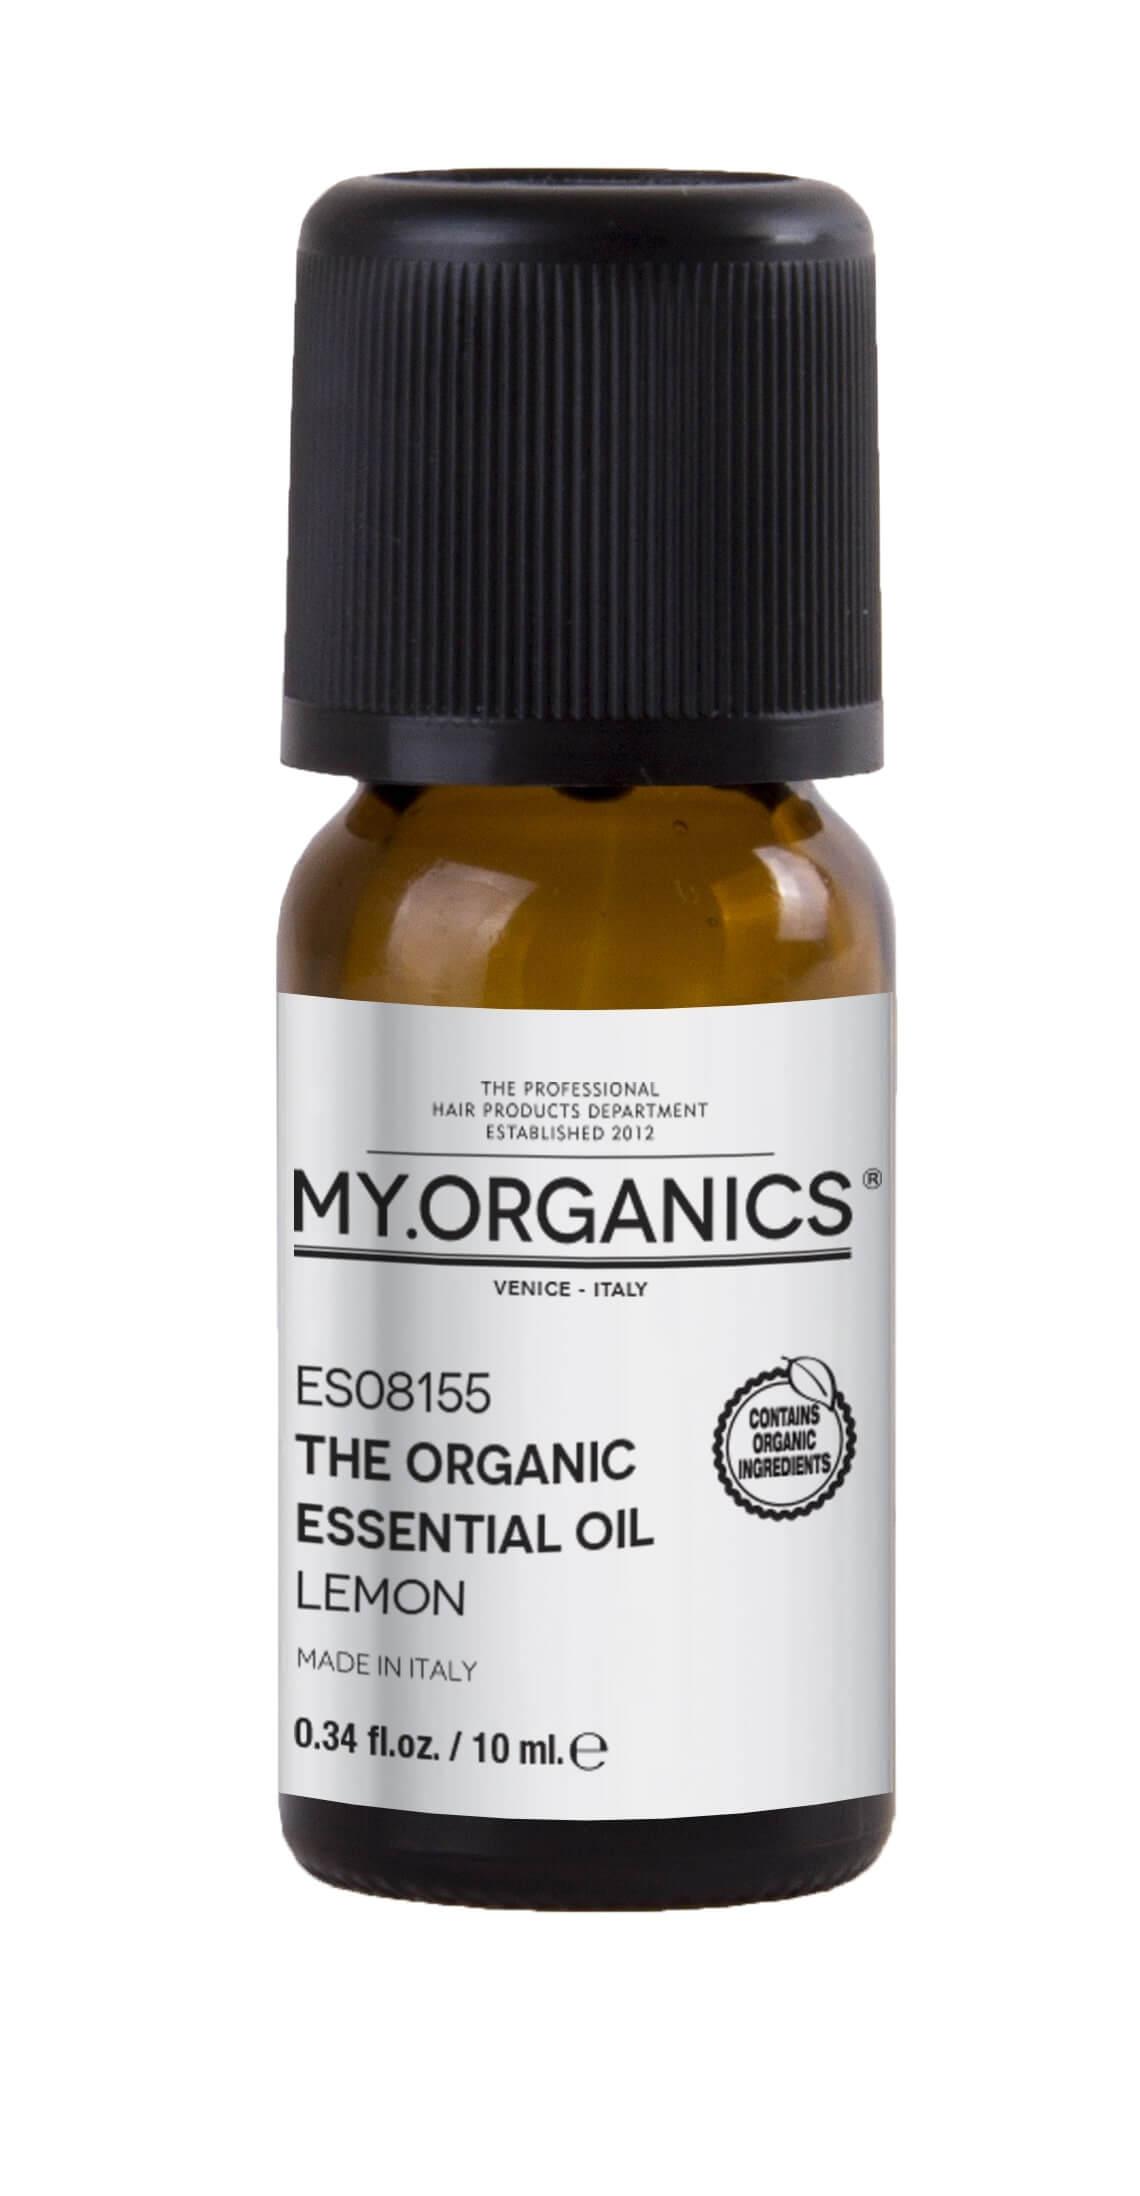 The Organic Essential Oil Lemon 10ml